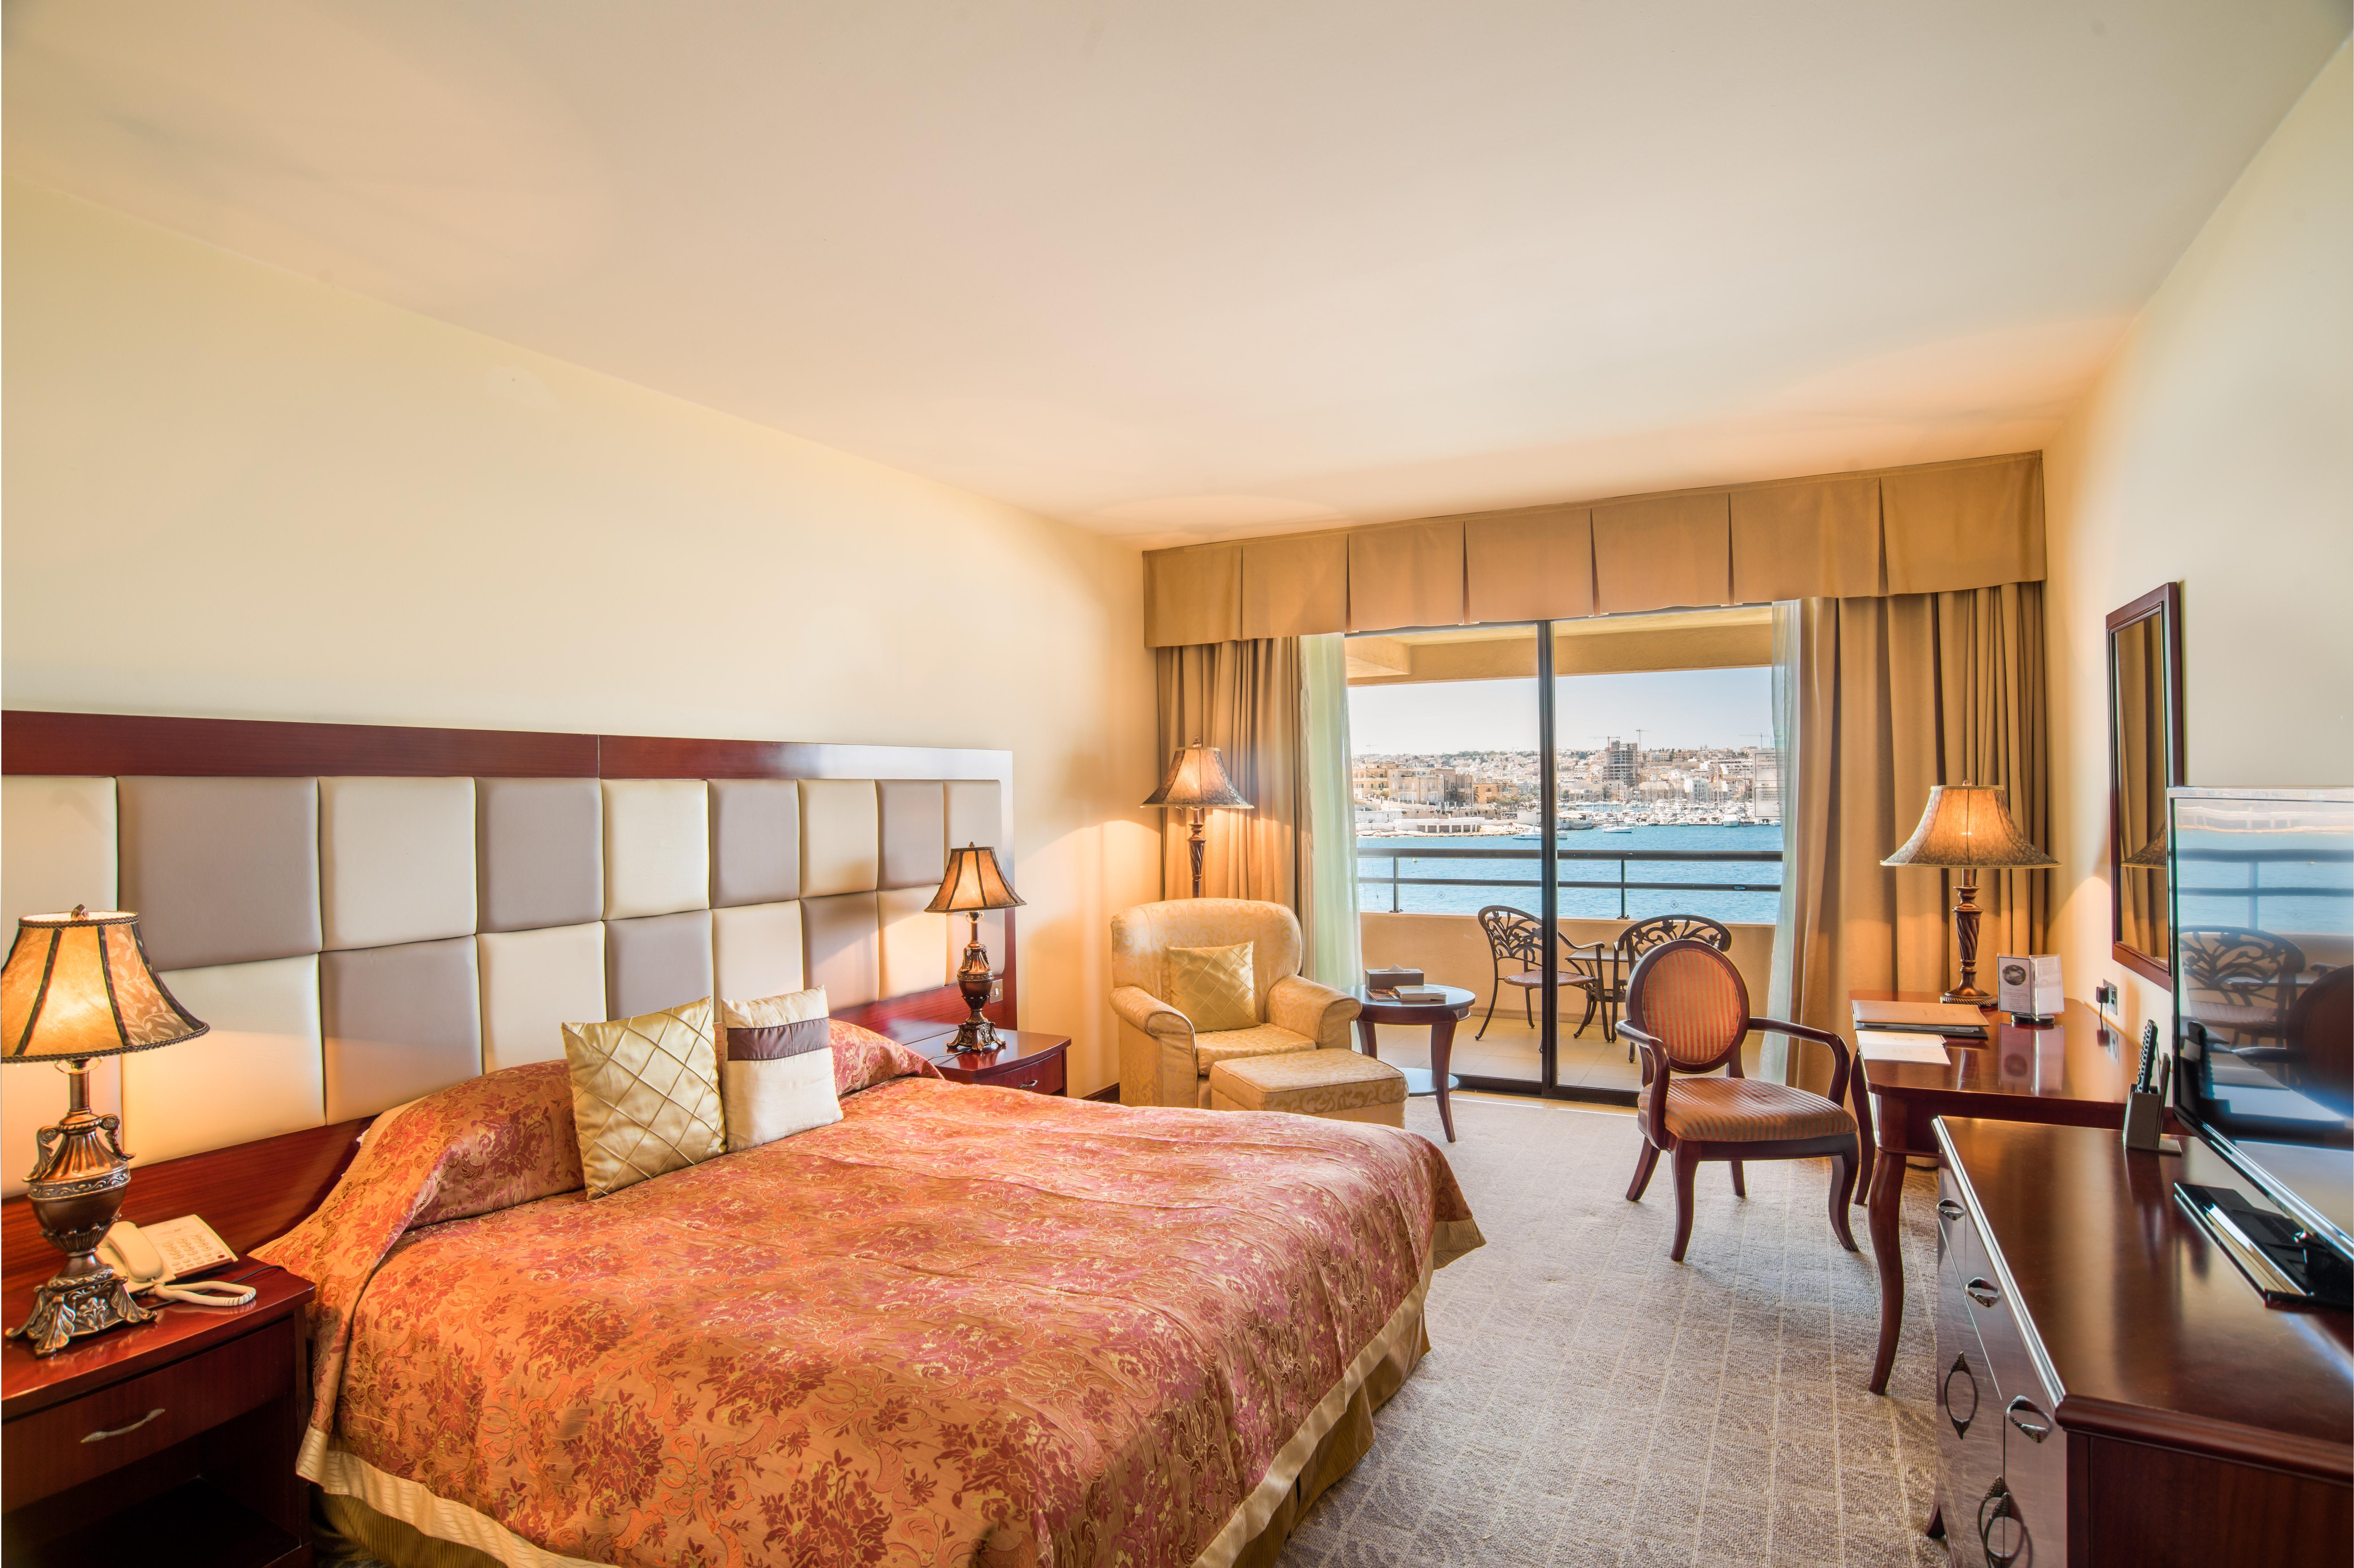 Grand Hotel Excelsior Malta Rooms Amp Suites Gallery 5